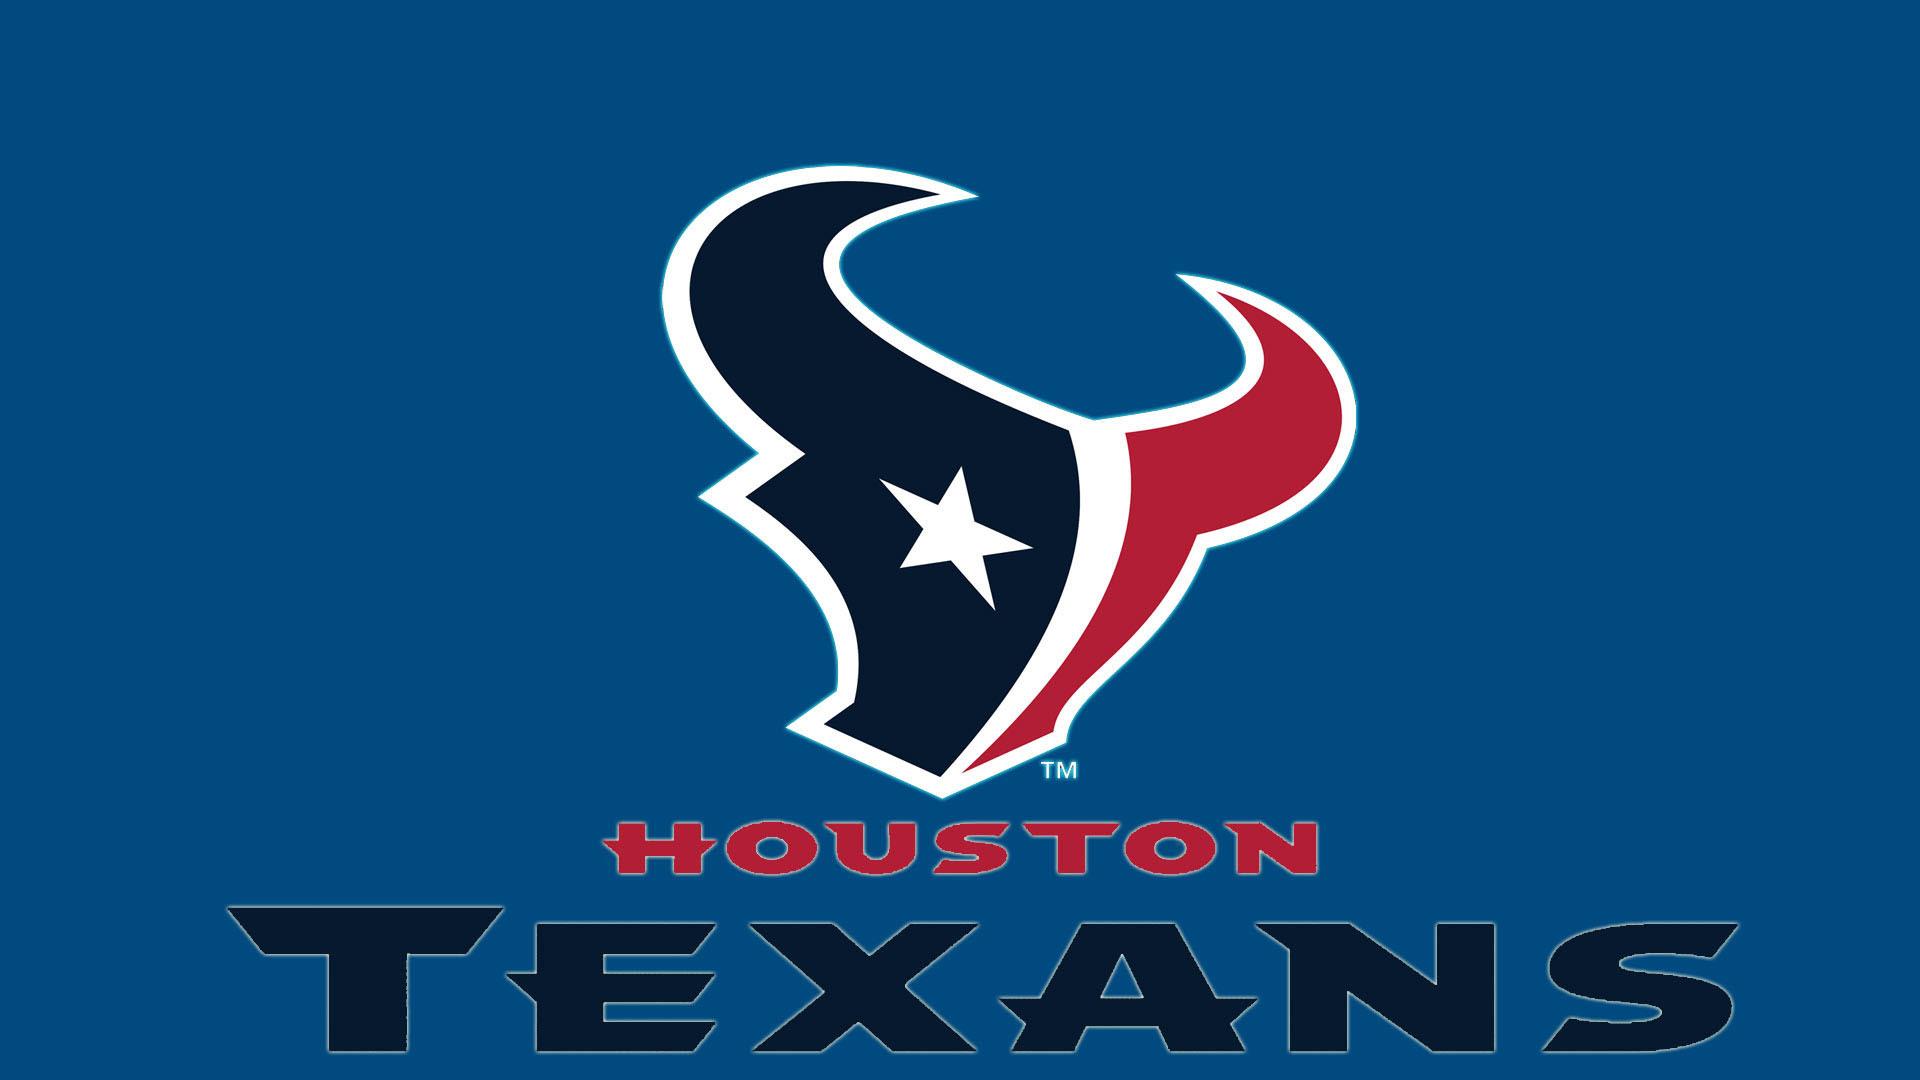 Houston Texans Wallpapers Hq